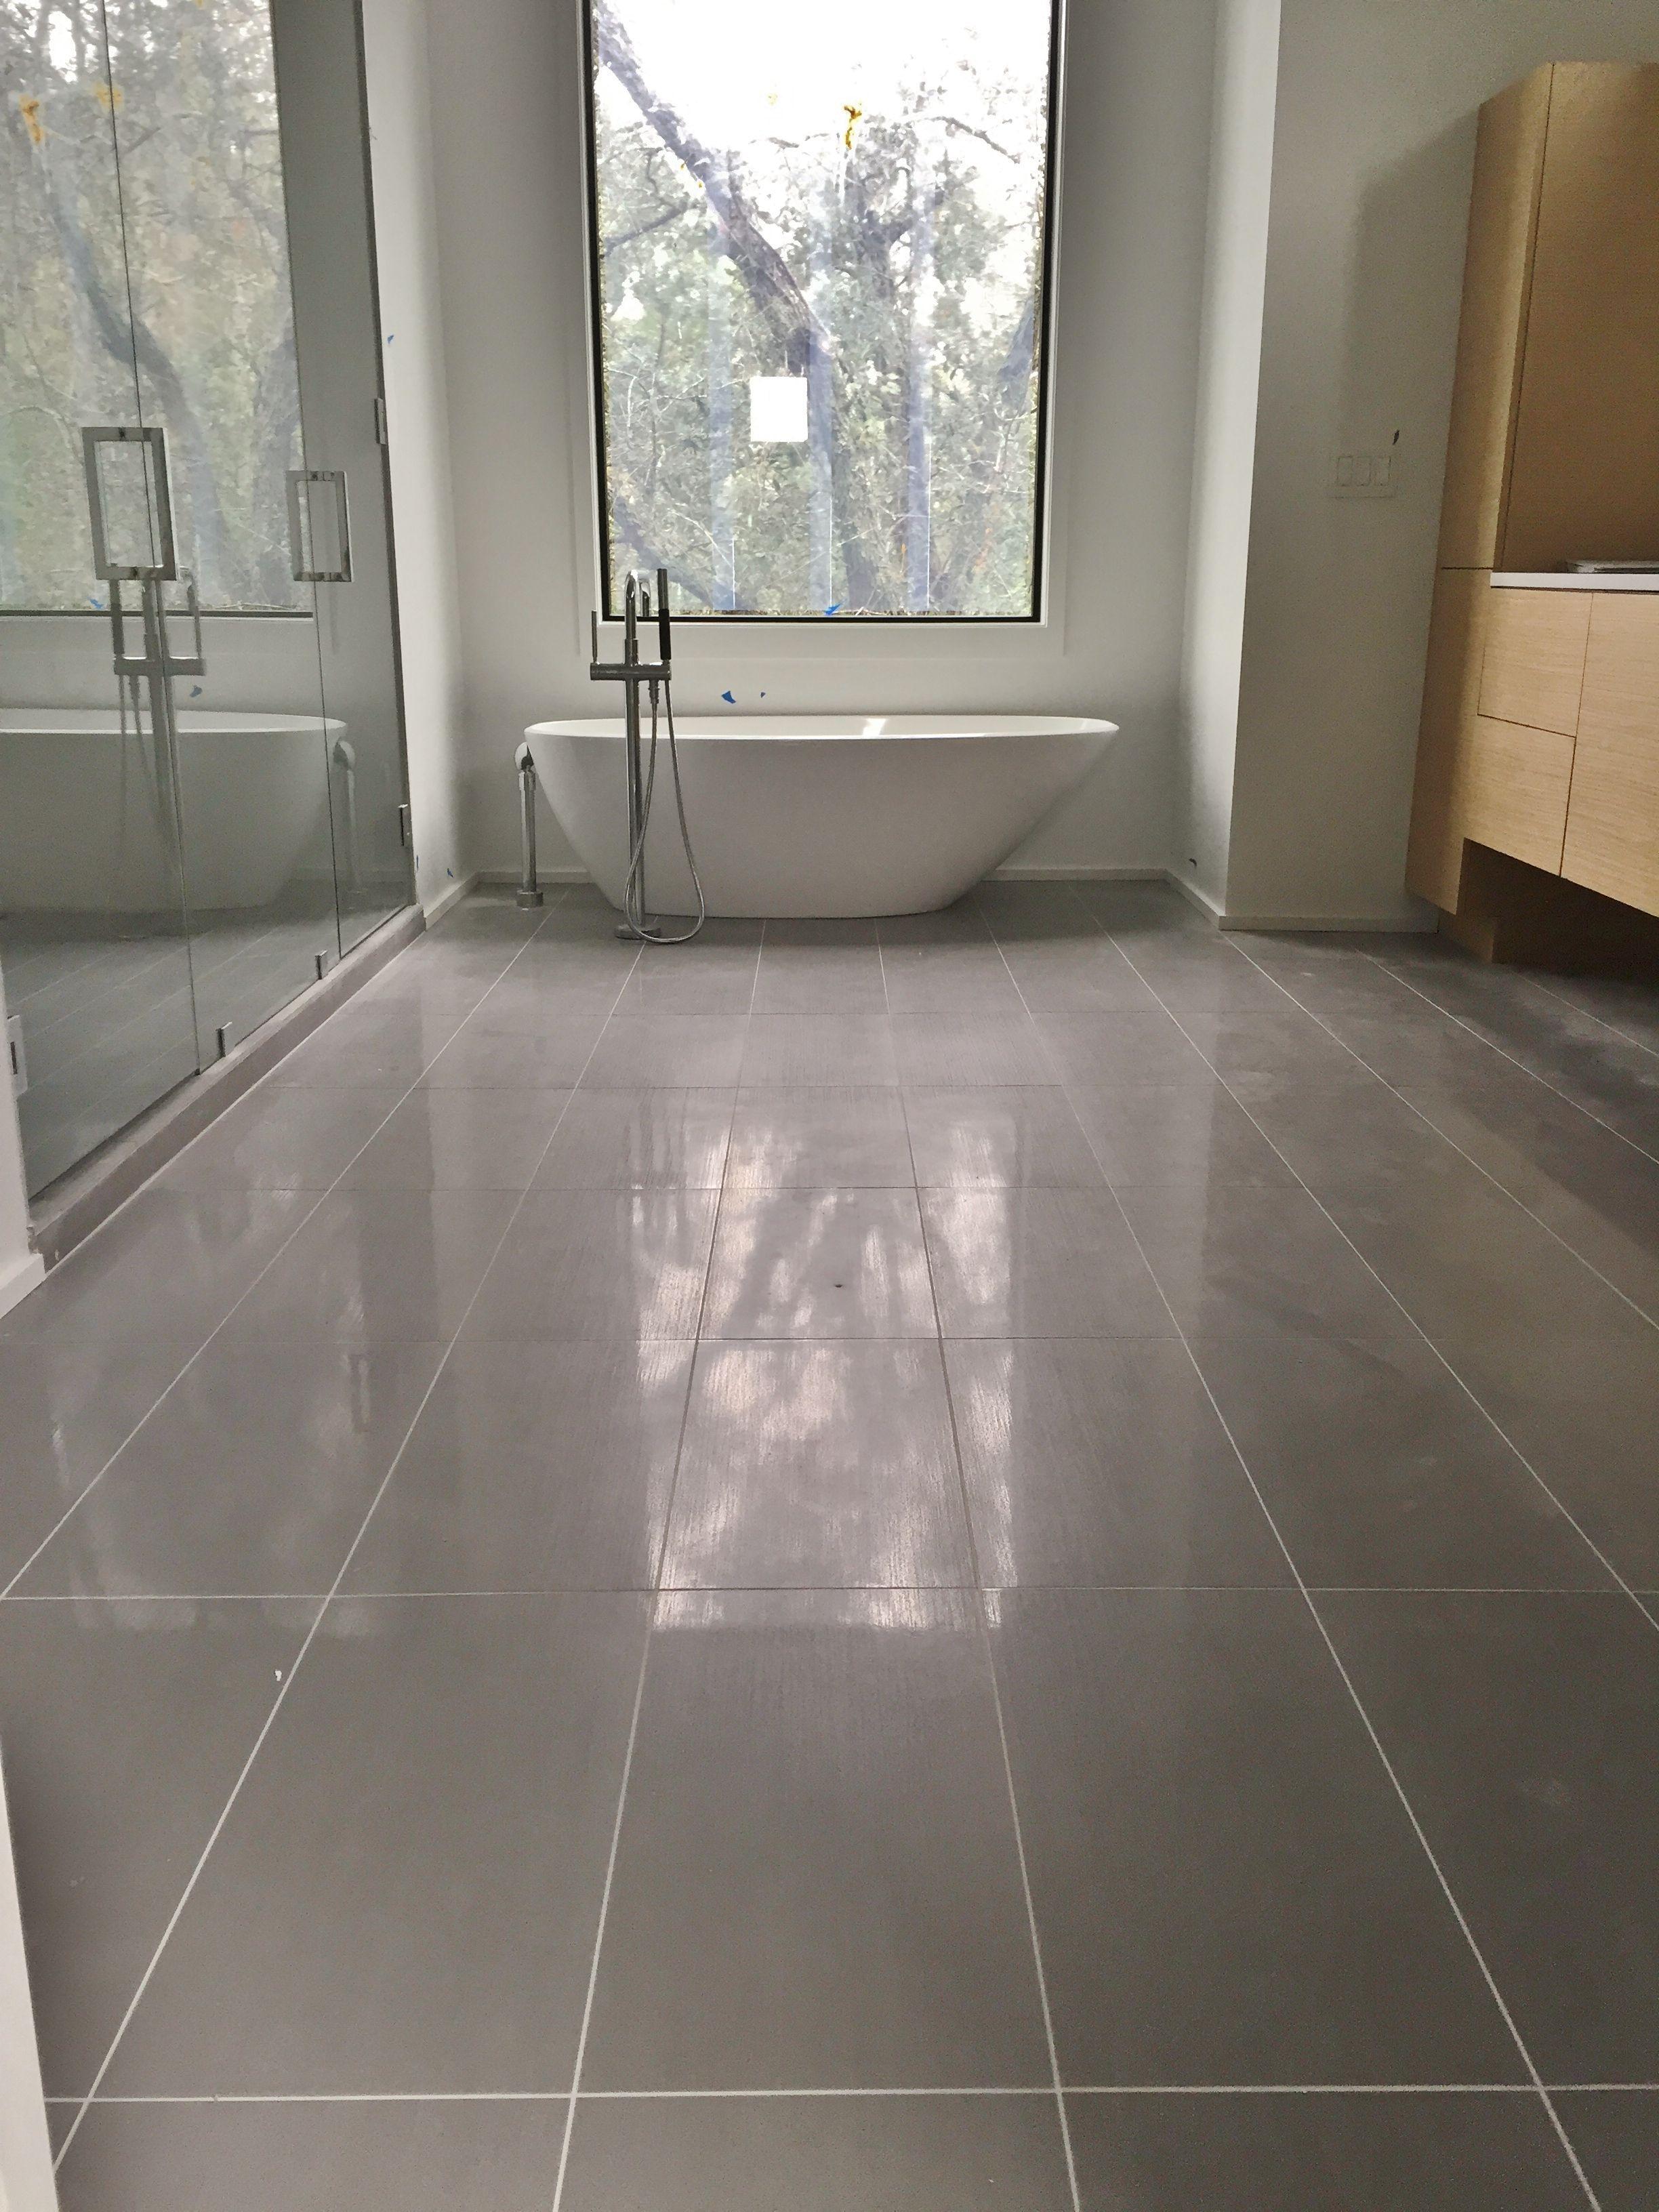 Porcelain Tile Bathroom Floor Tiles Ideas Trendecors